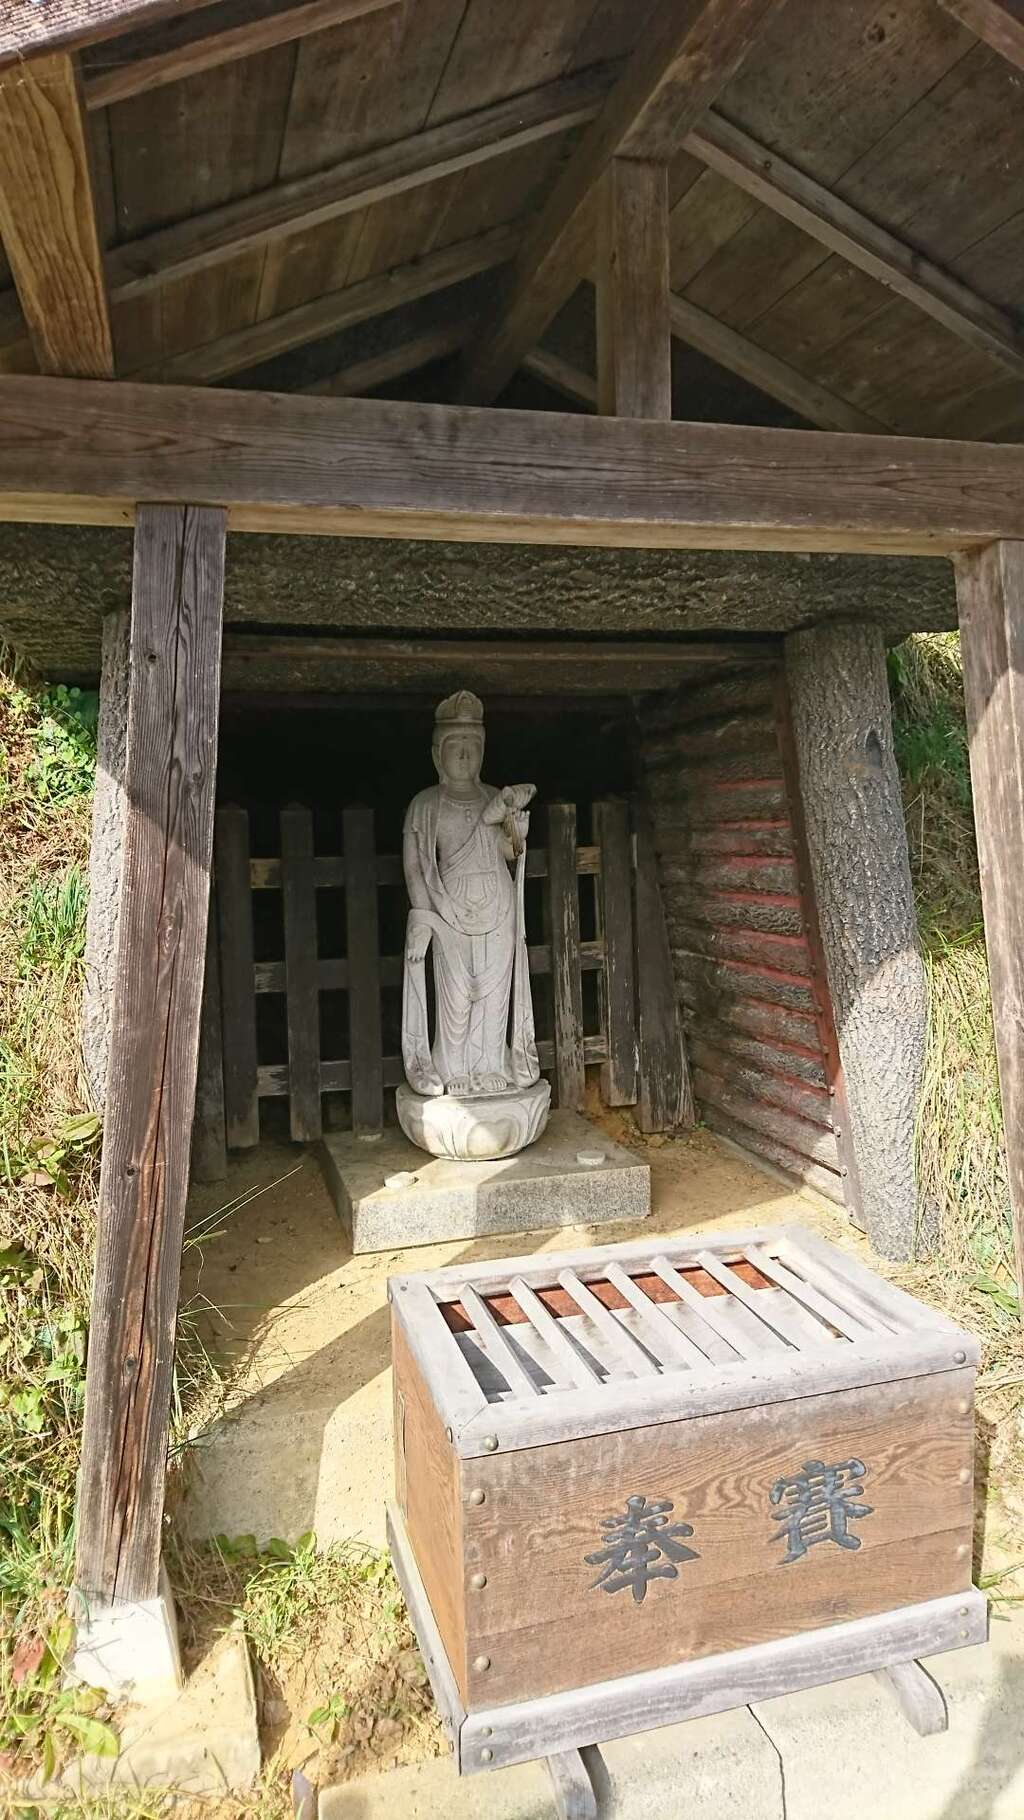 天照御祖神社の仏像